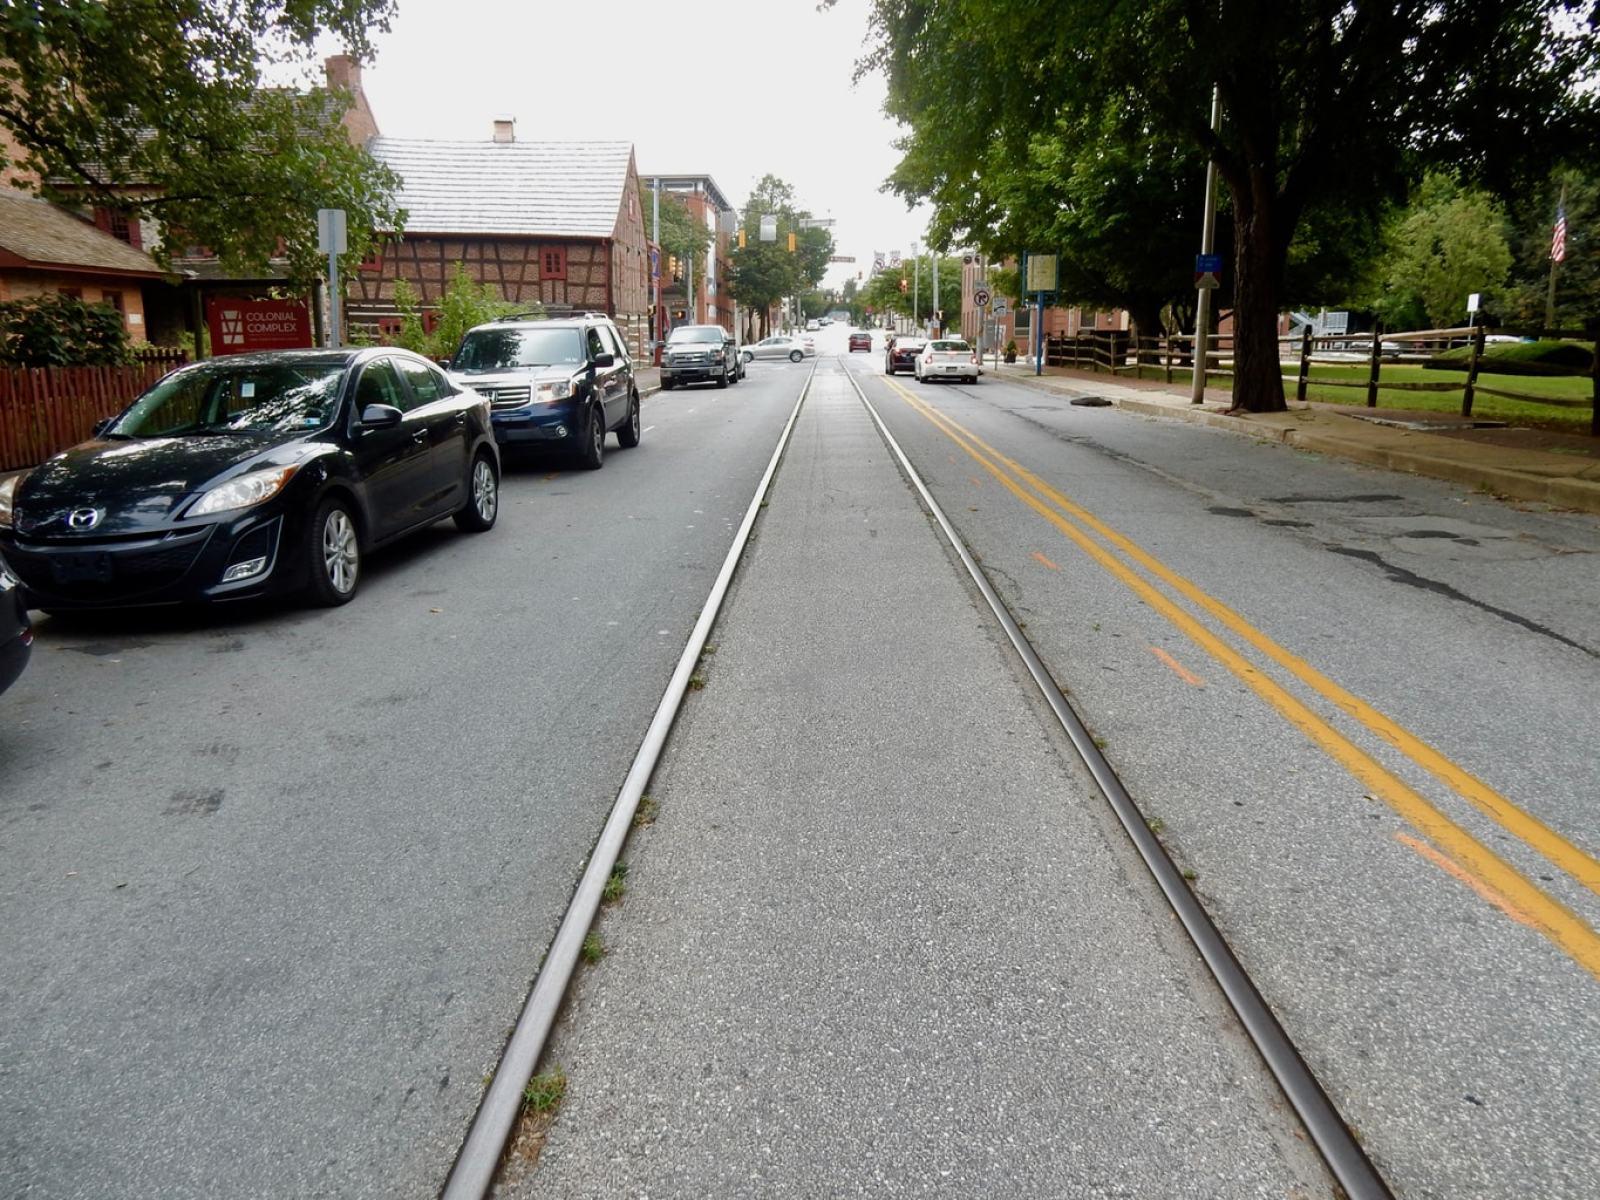 Active Train Tracks in Street York PA